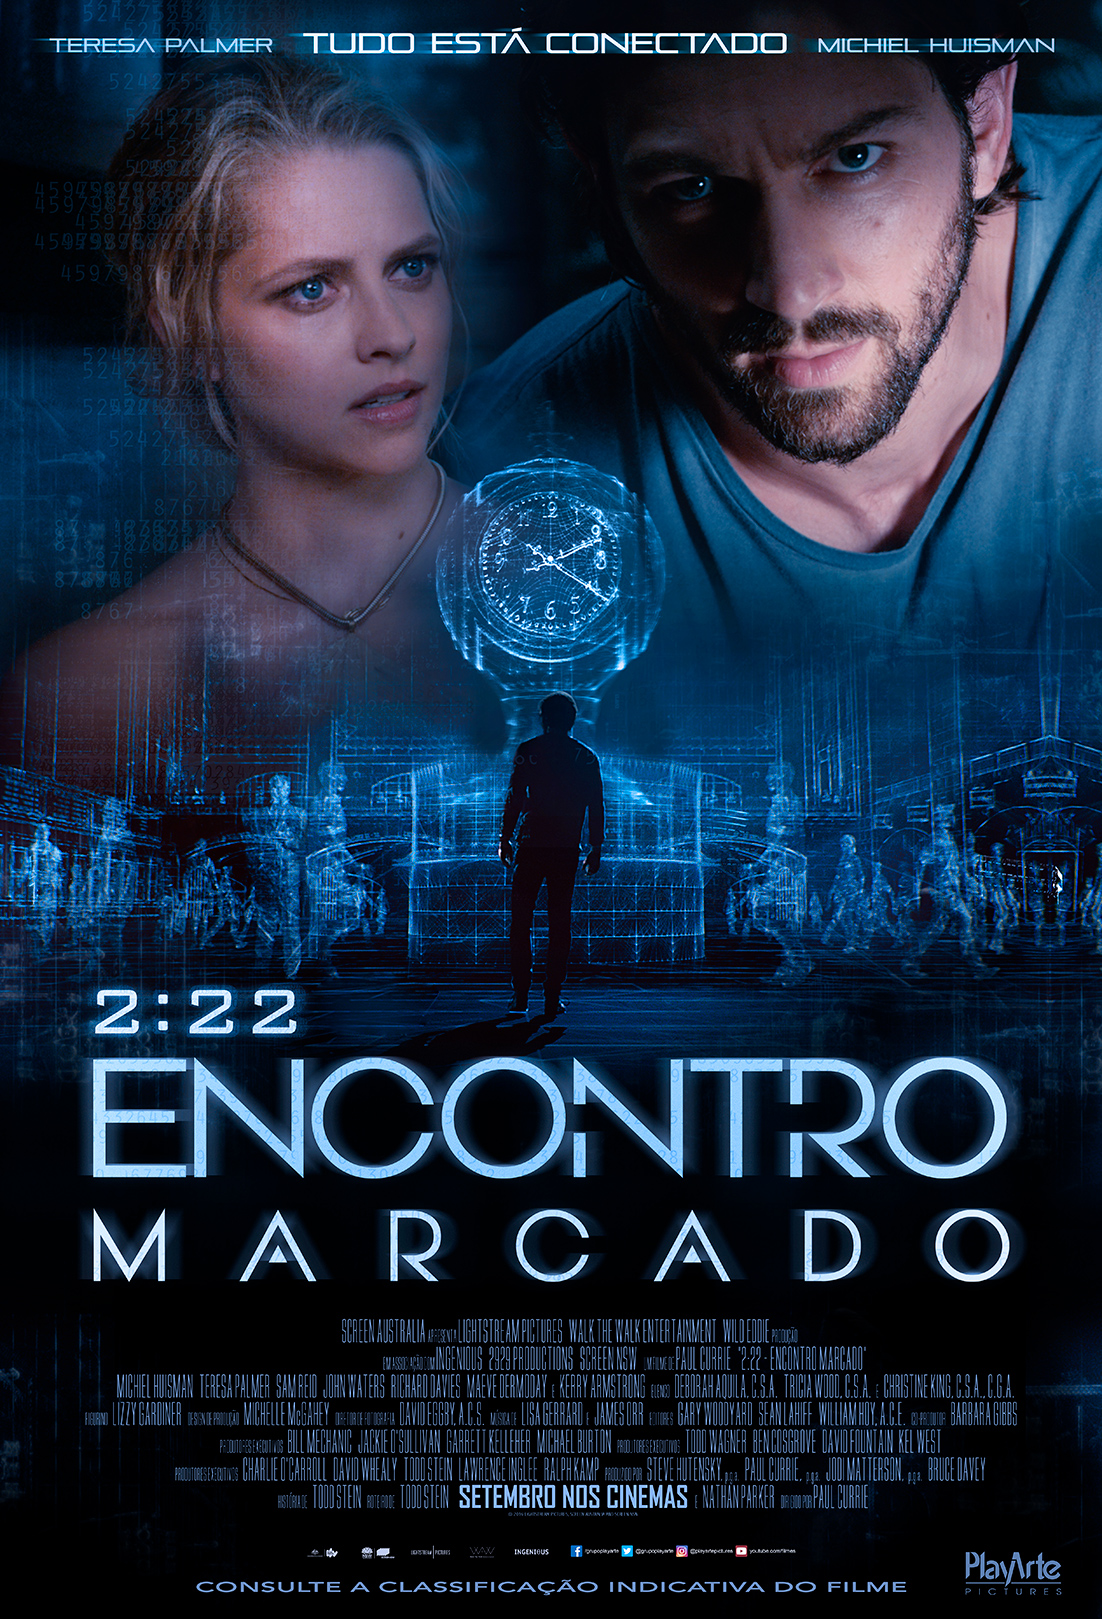 2:22 - Encontro Marcado - Filme 2017 - AdoroCinema